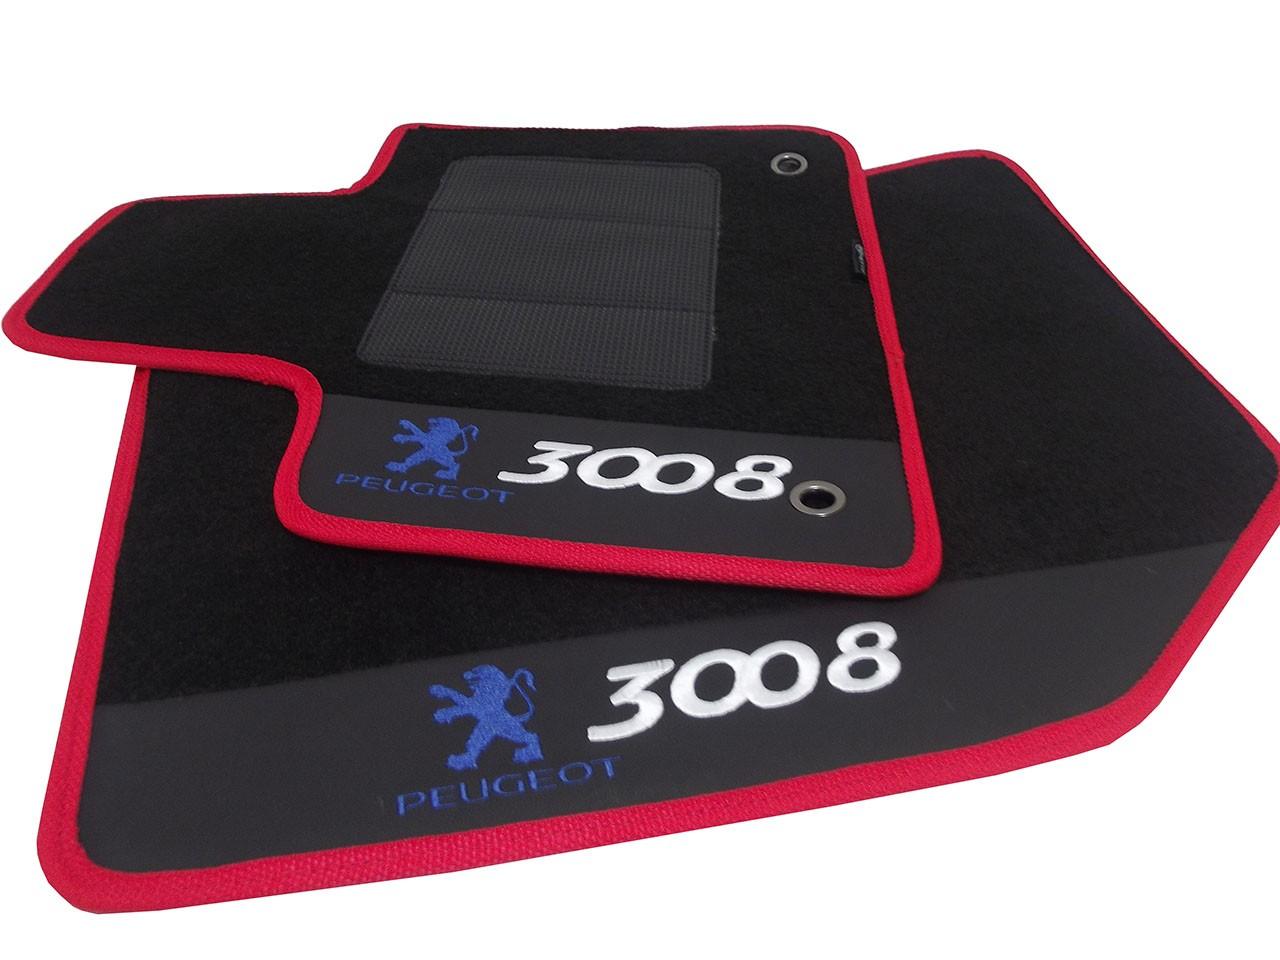 Tapete Peugeot 3008 Carpete Luxo Base Borracha Pinada